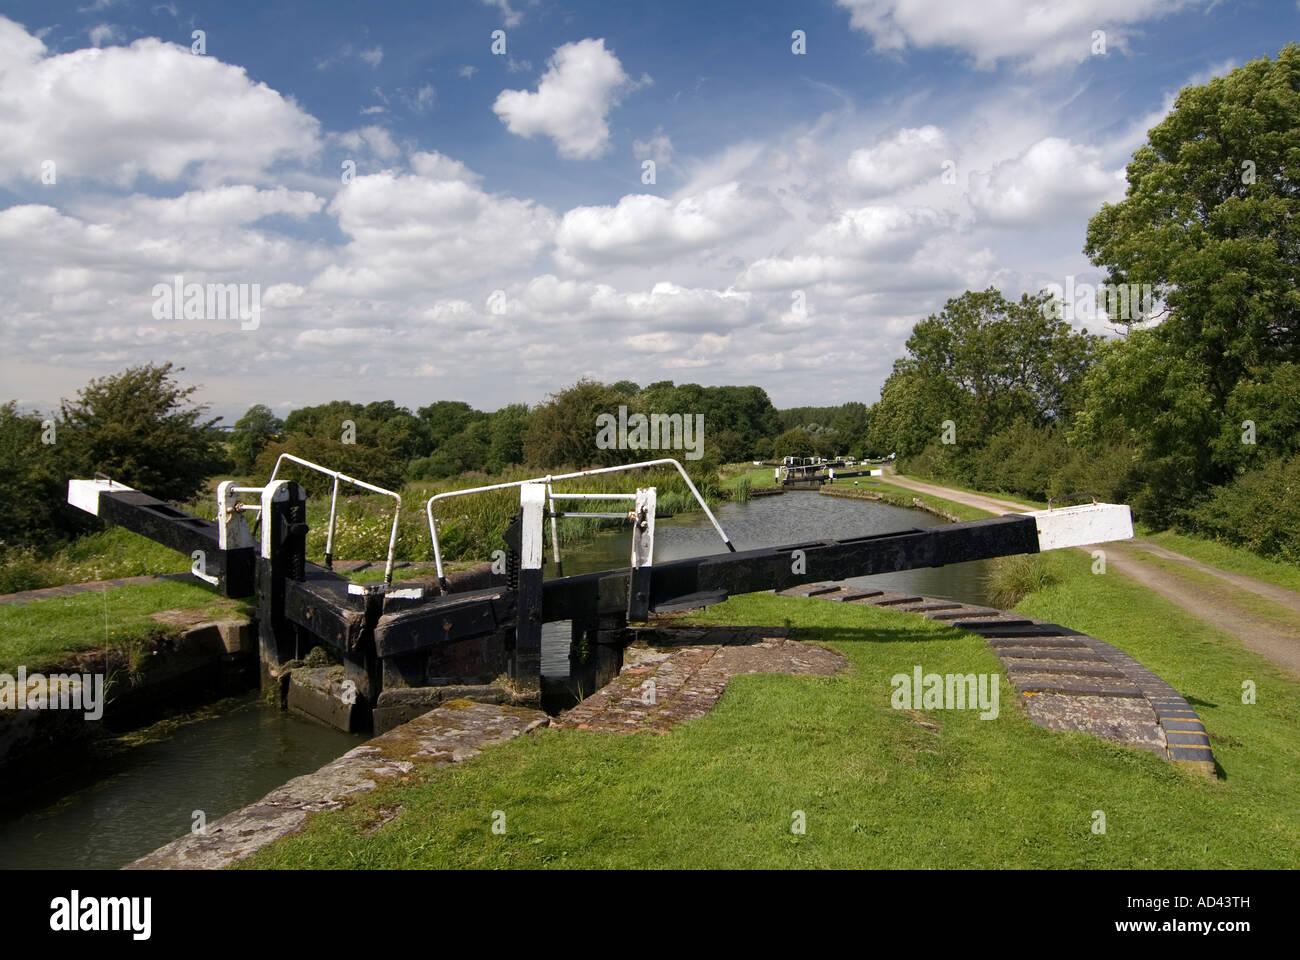 Doug Blane The Northampton arm of the Grand Union canal Stock Photo